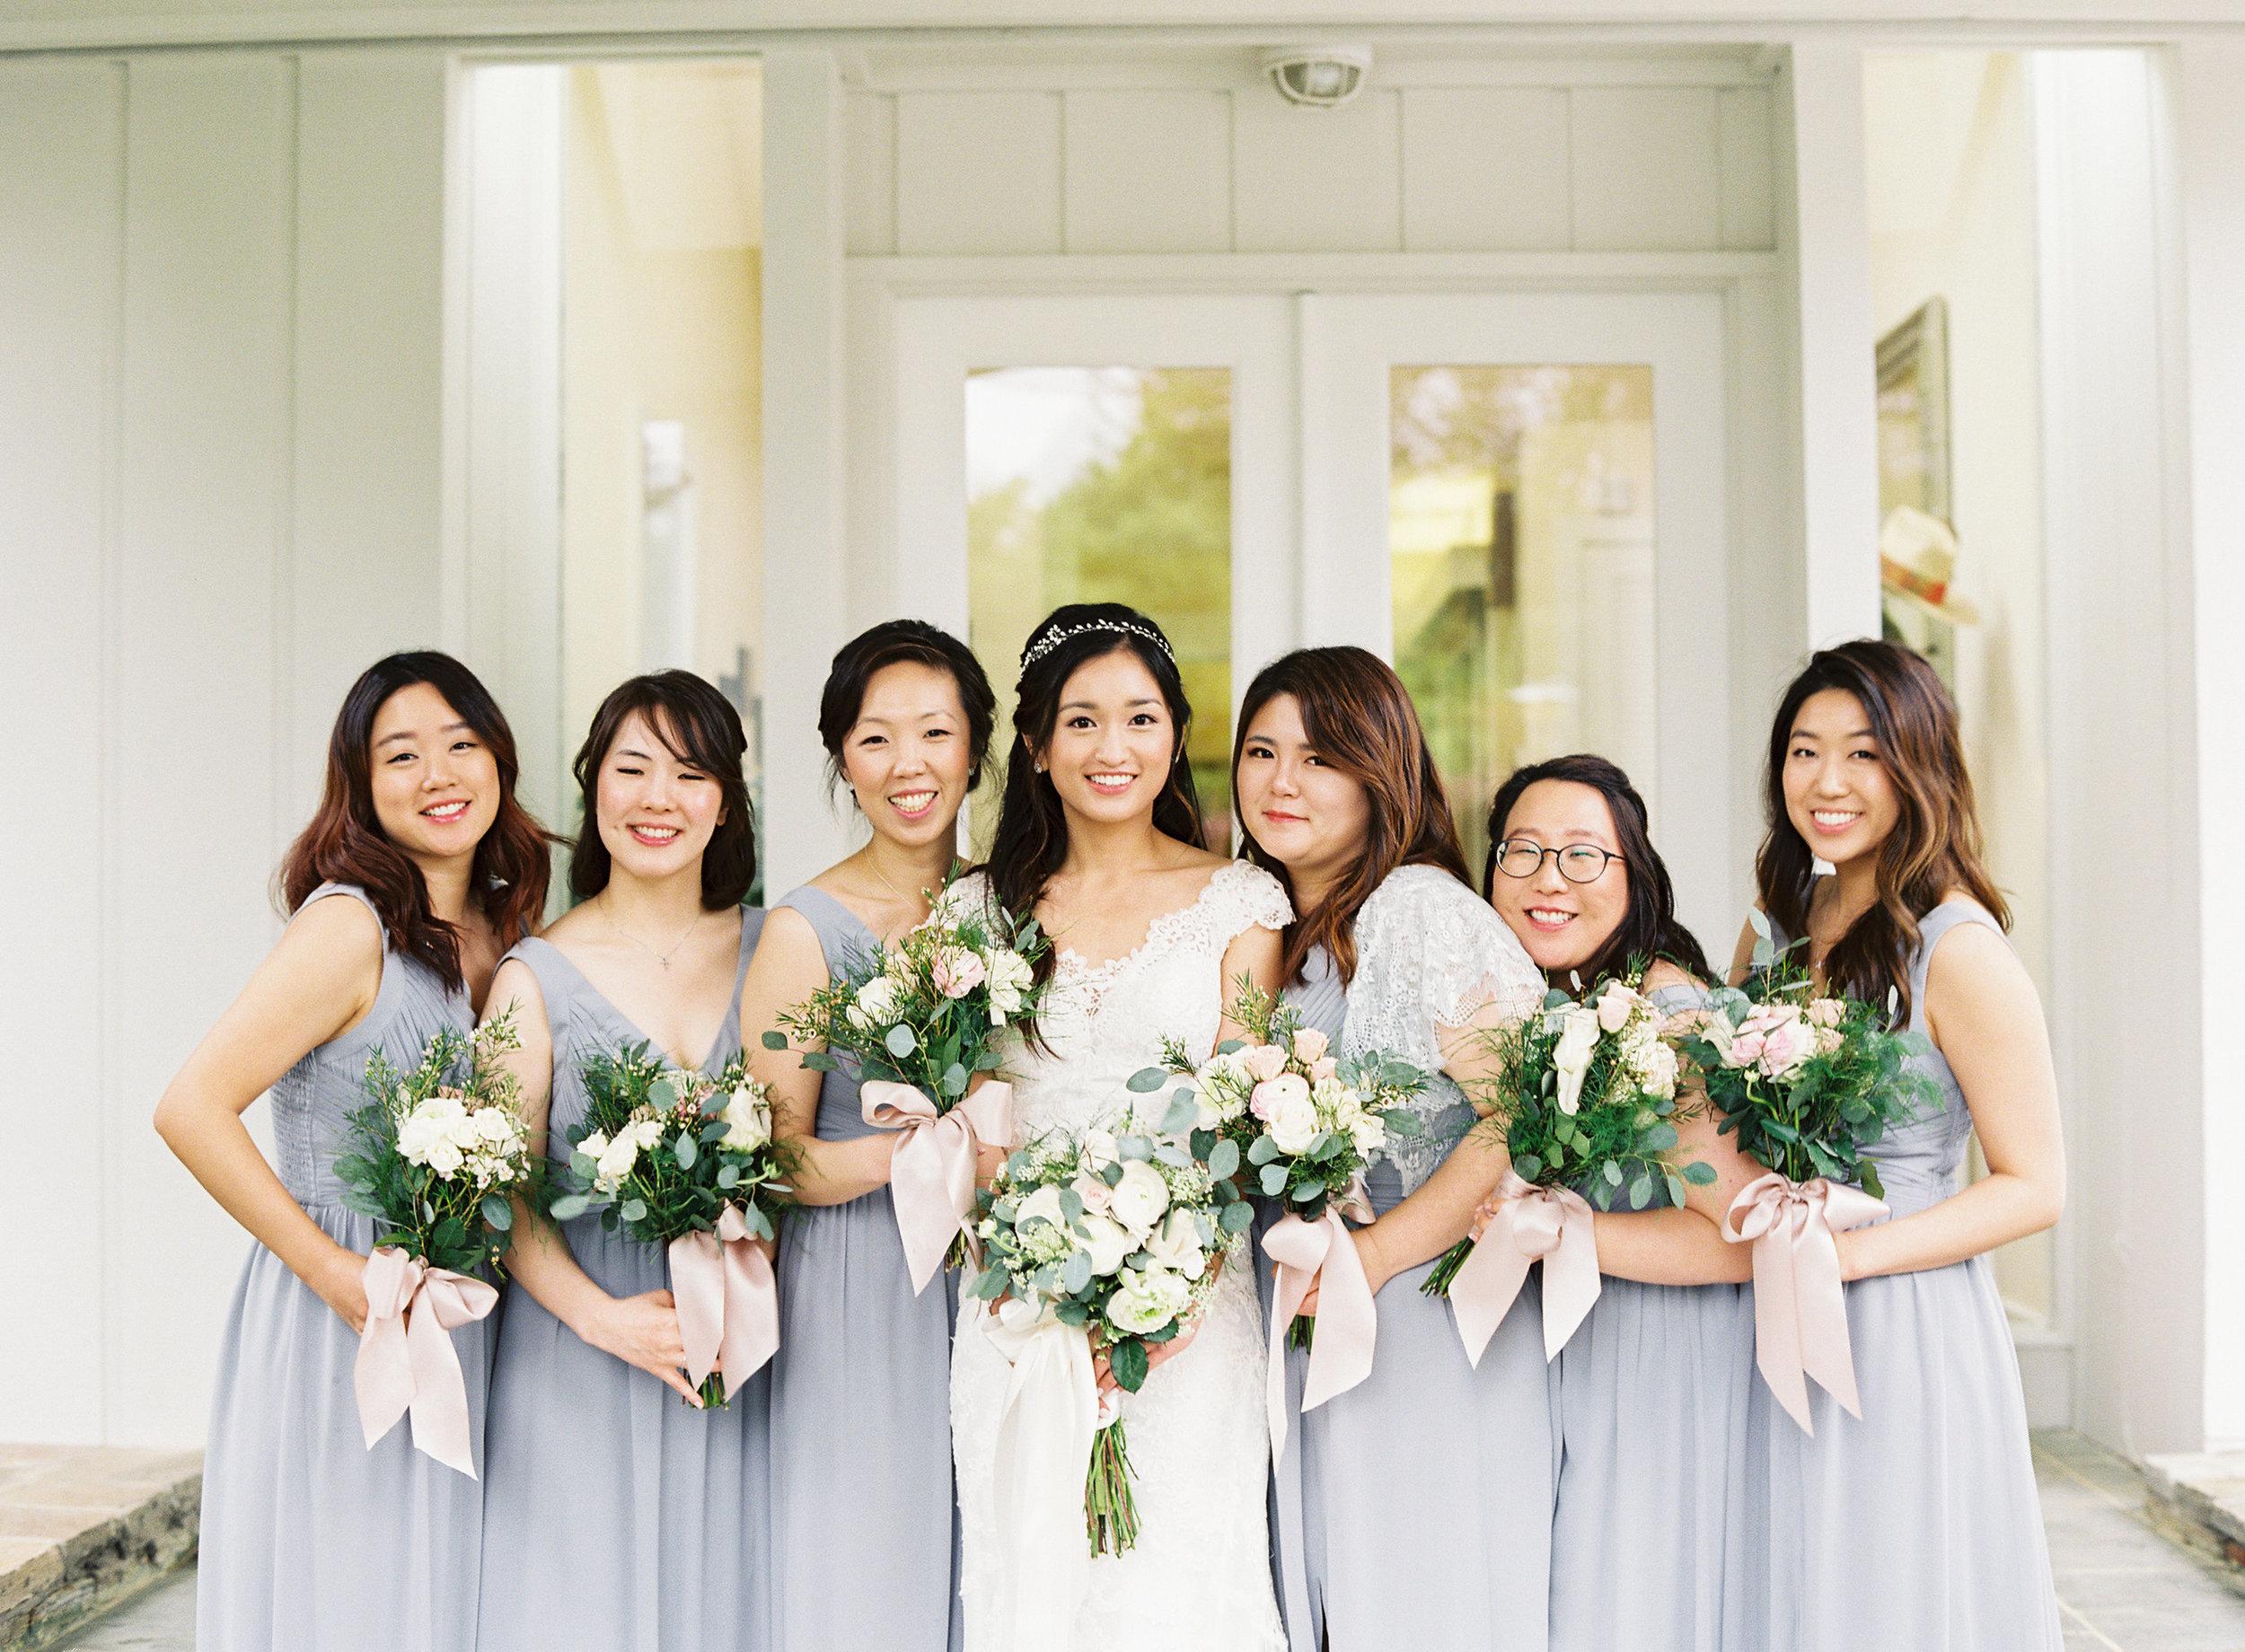 JA_Wedding_Jennifer_Bridesmaids_001.jpg